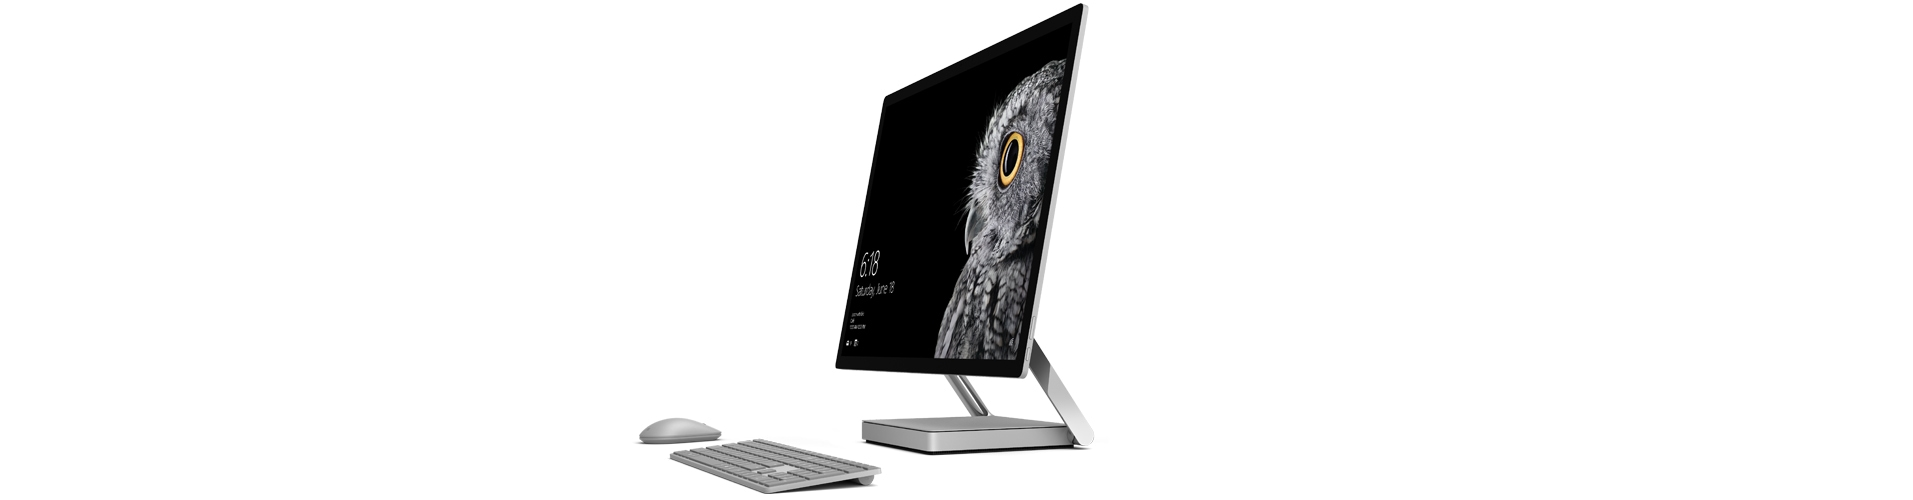 Surface マウスとキーボードを備え、縦位置になった Surface Studio。